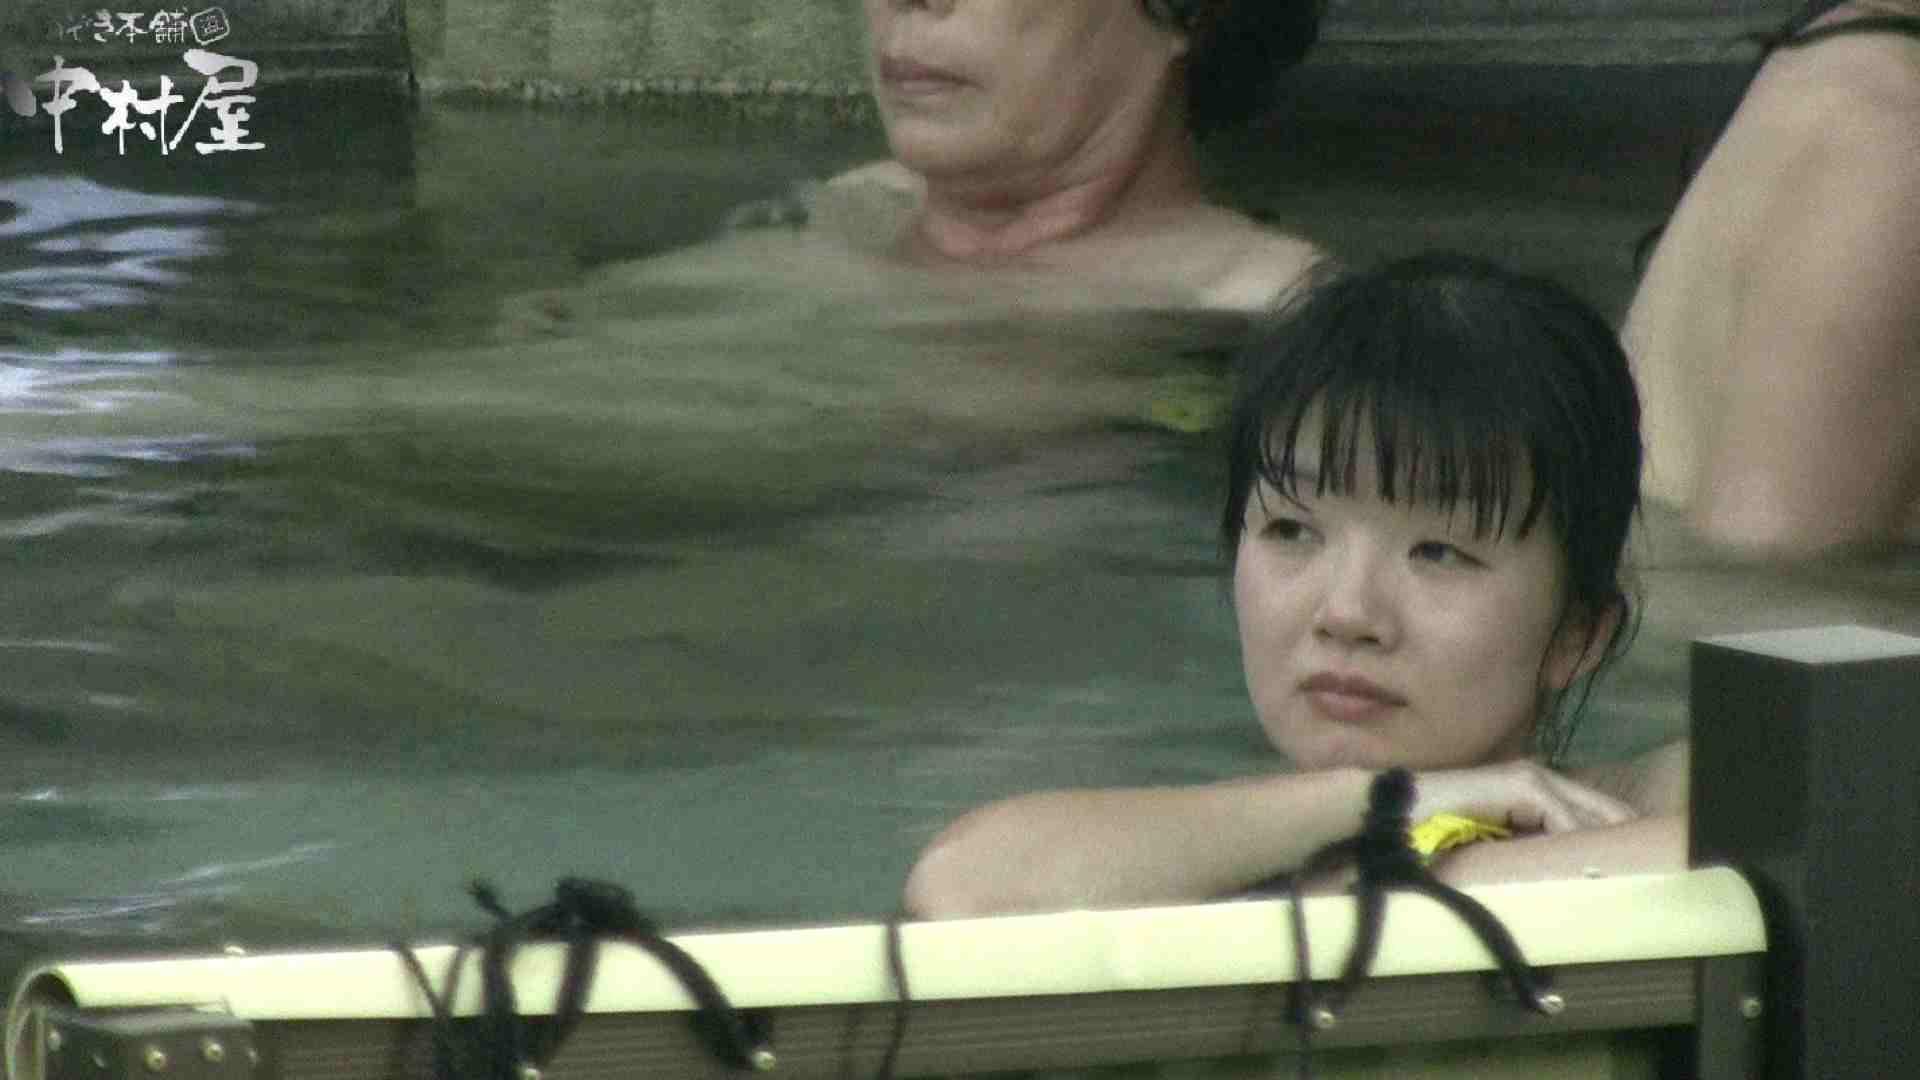 Aquaな露天風呂Vol.904 美しいOLの裸体 オメコ動画キャプチャ 103pic 29